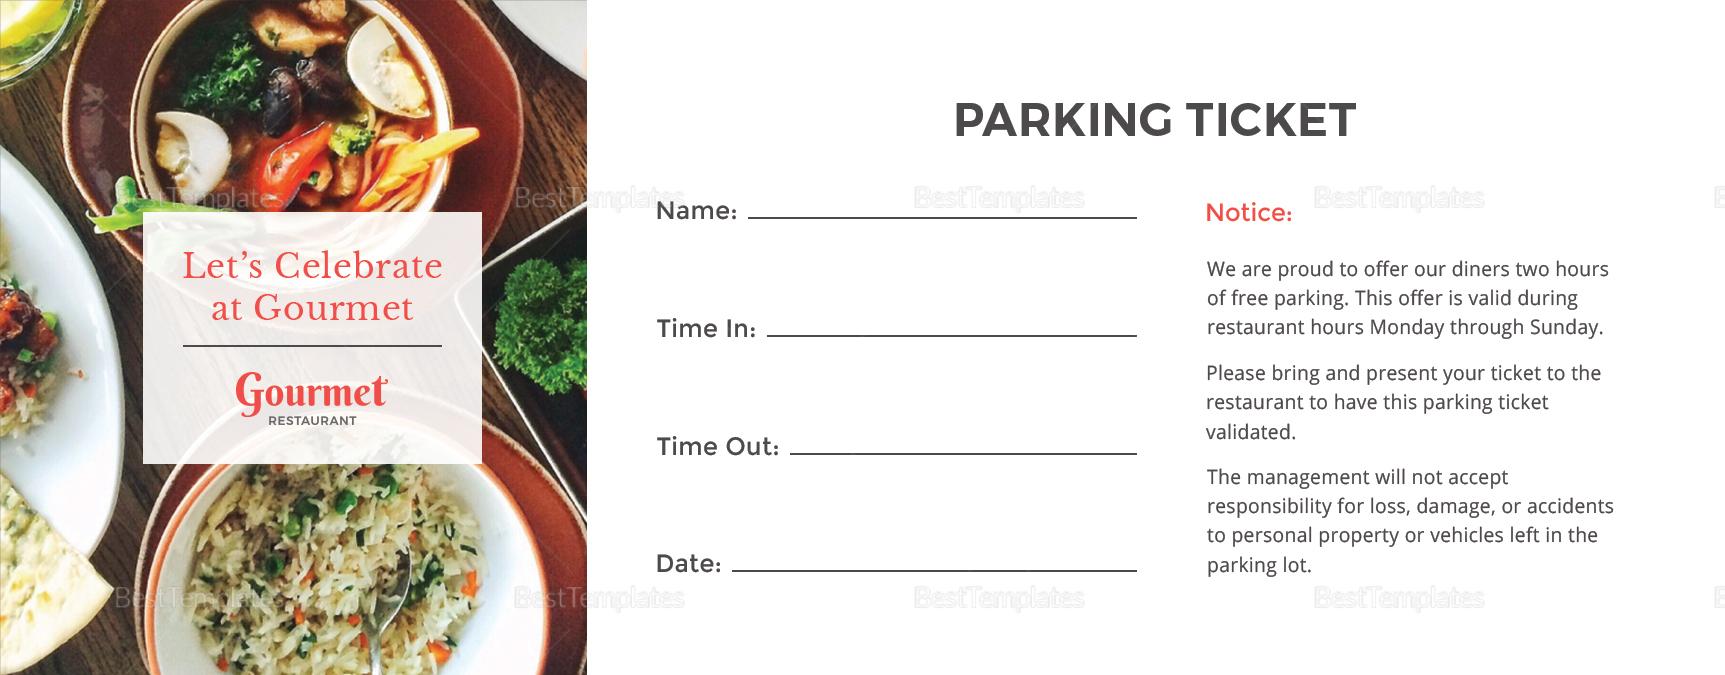 Restaurant Parking Ticket Template